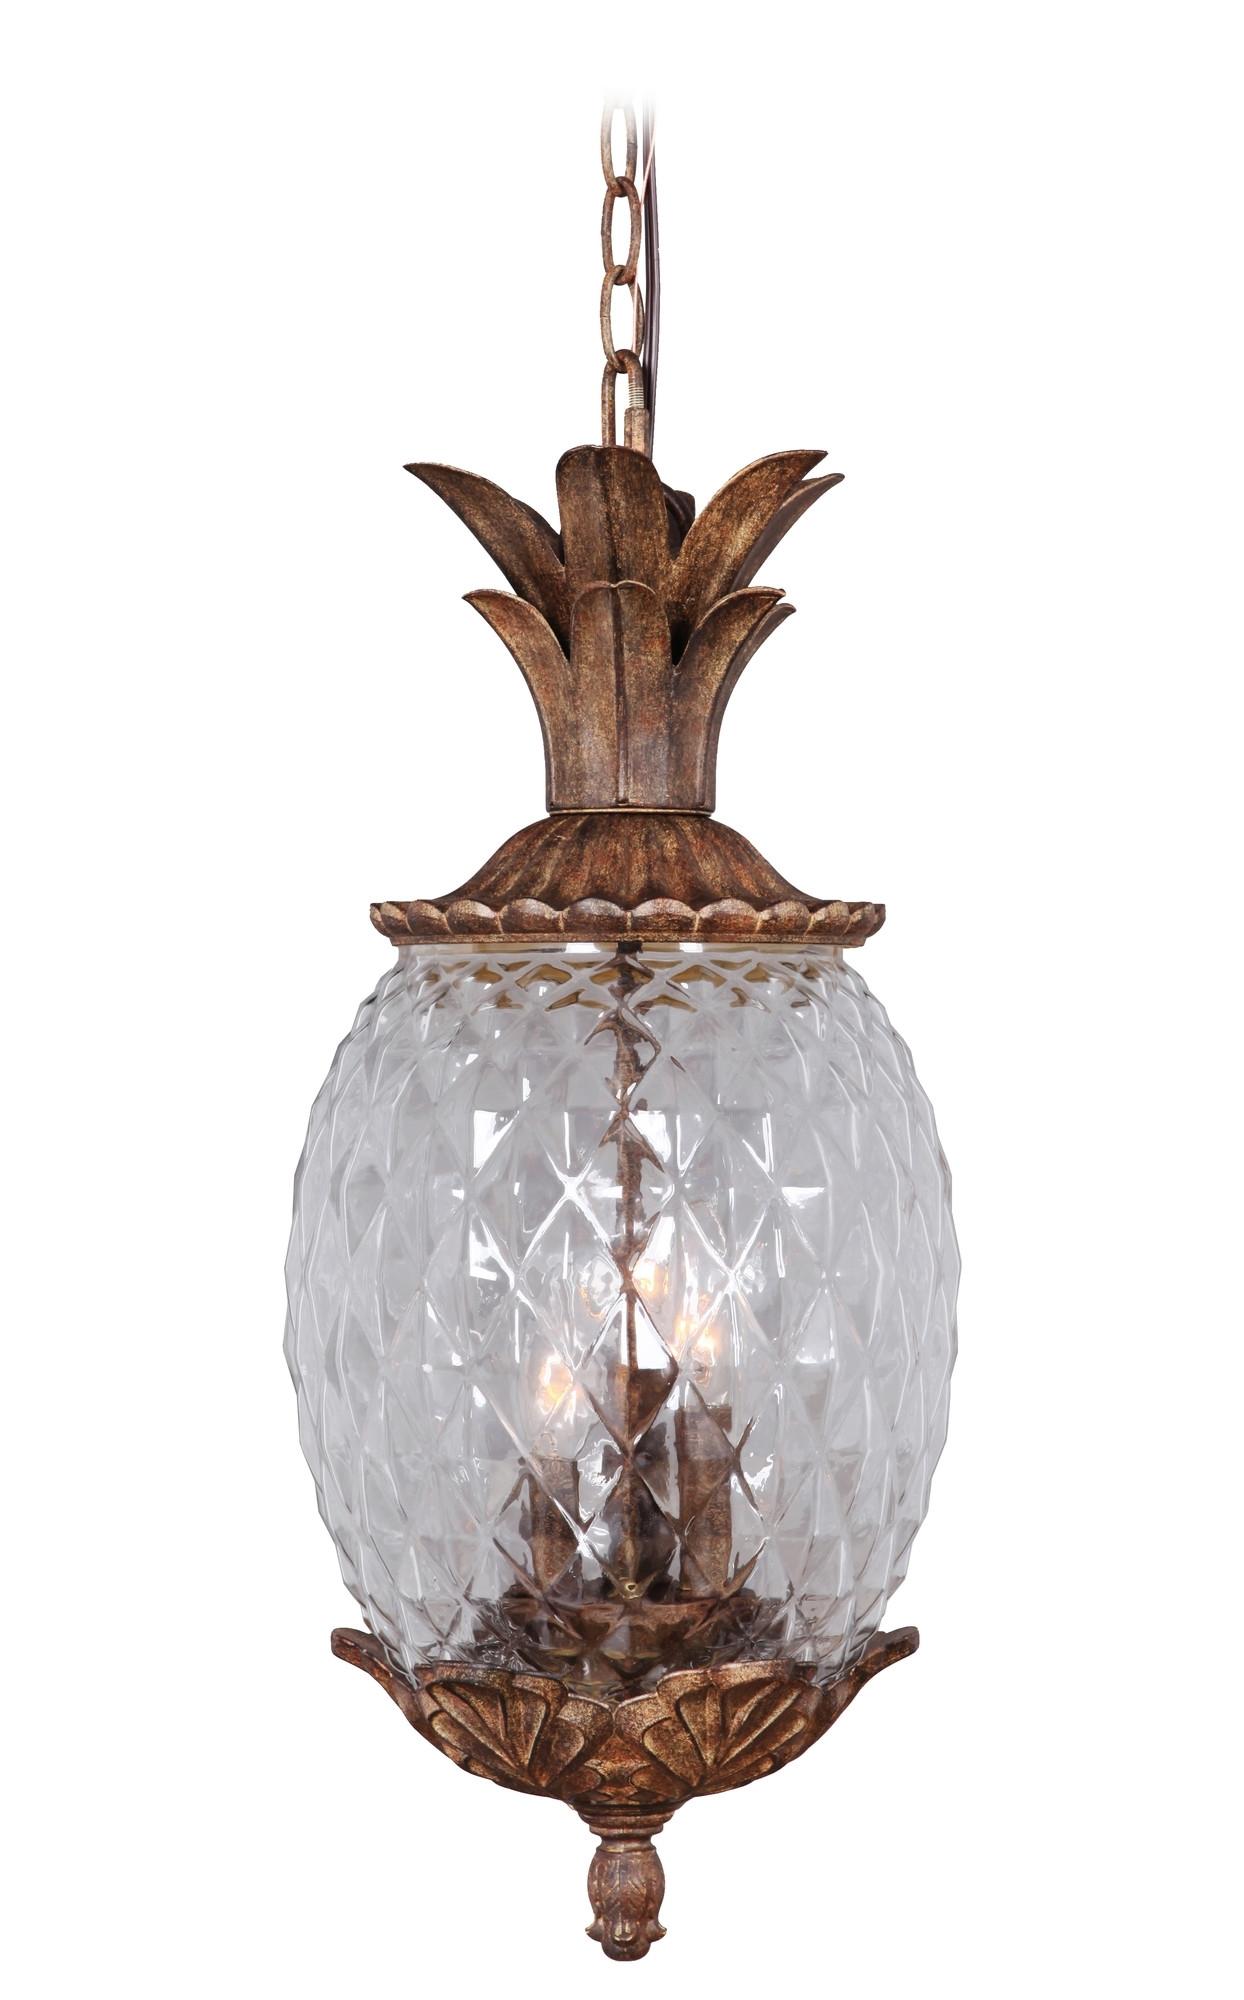 Inspiration about Marianahome Pineapple 3 Light Pendant & Reviews | Wayfair | Lighting Pertaining To Wayfair Outdoor Hanging Lights (#10 of 15)